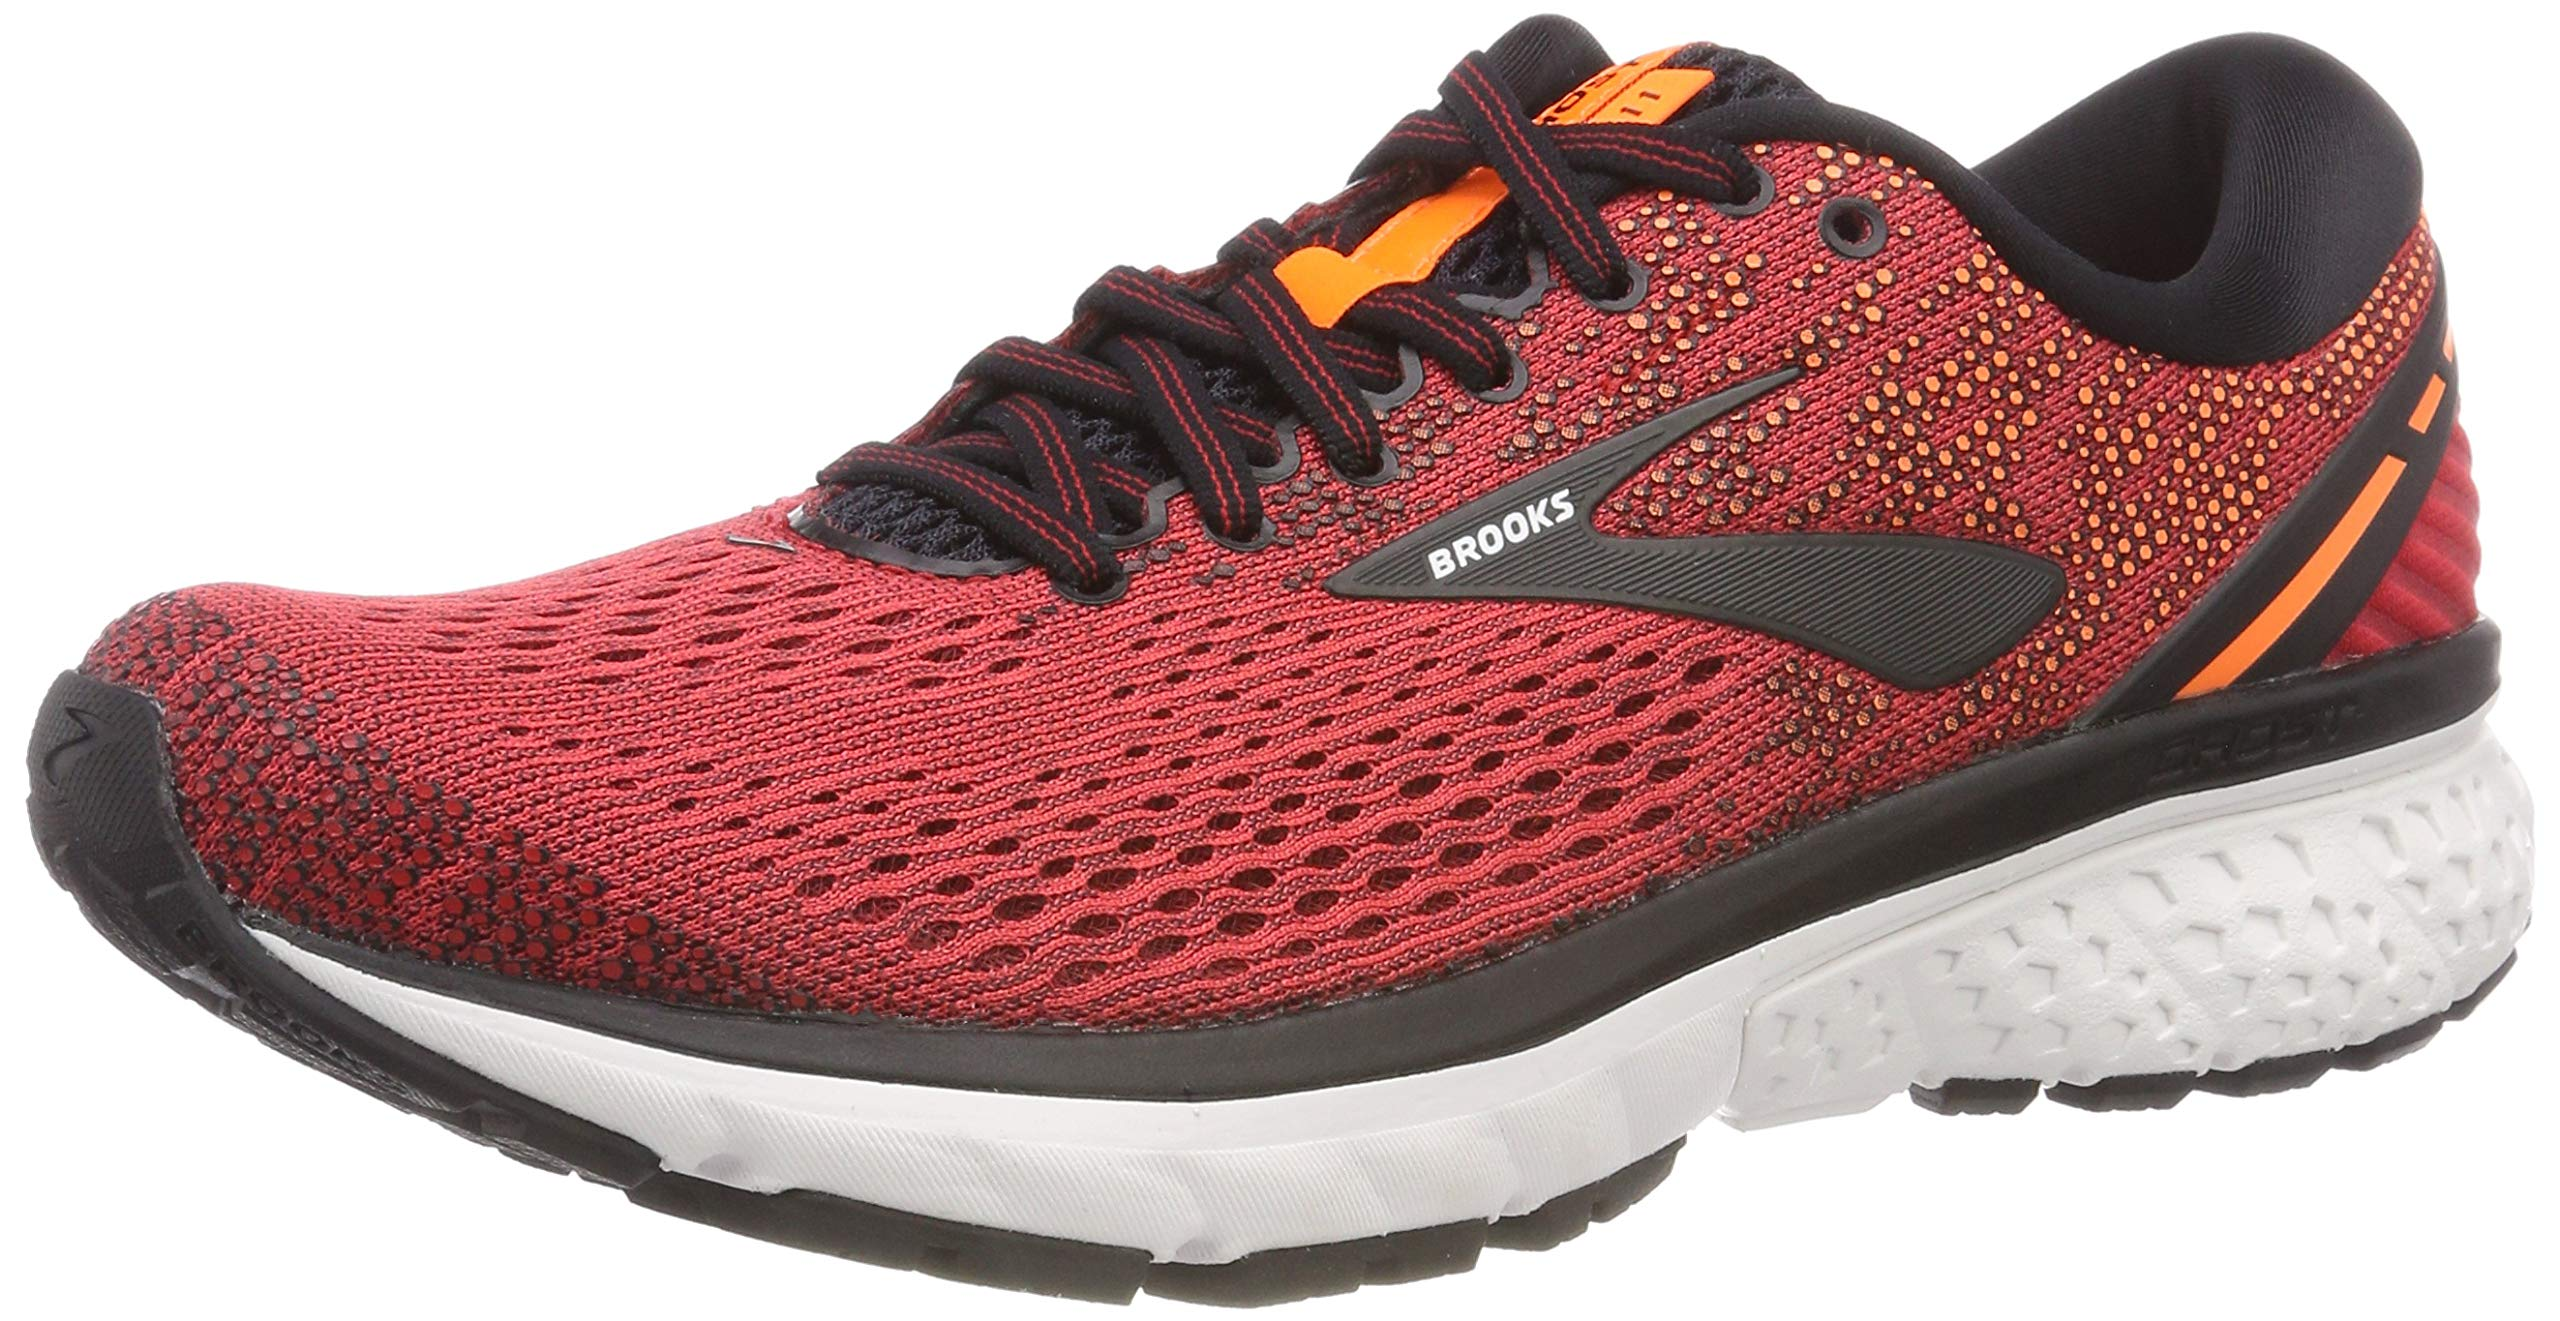 Brooks Mens Ghost 11 Running Shoe - Red/Black/Orange - D - 7.0